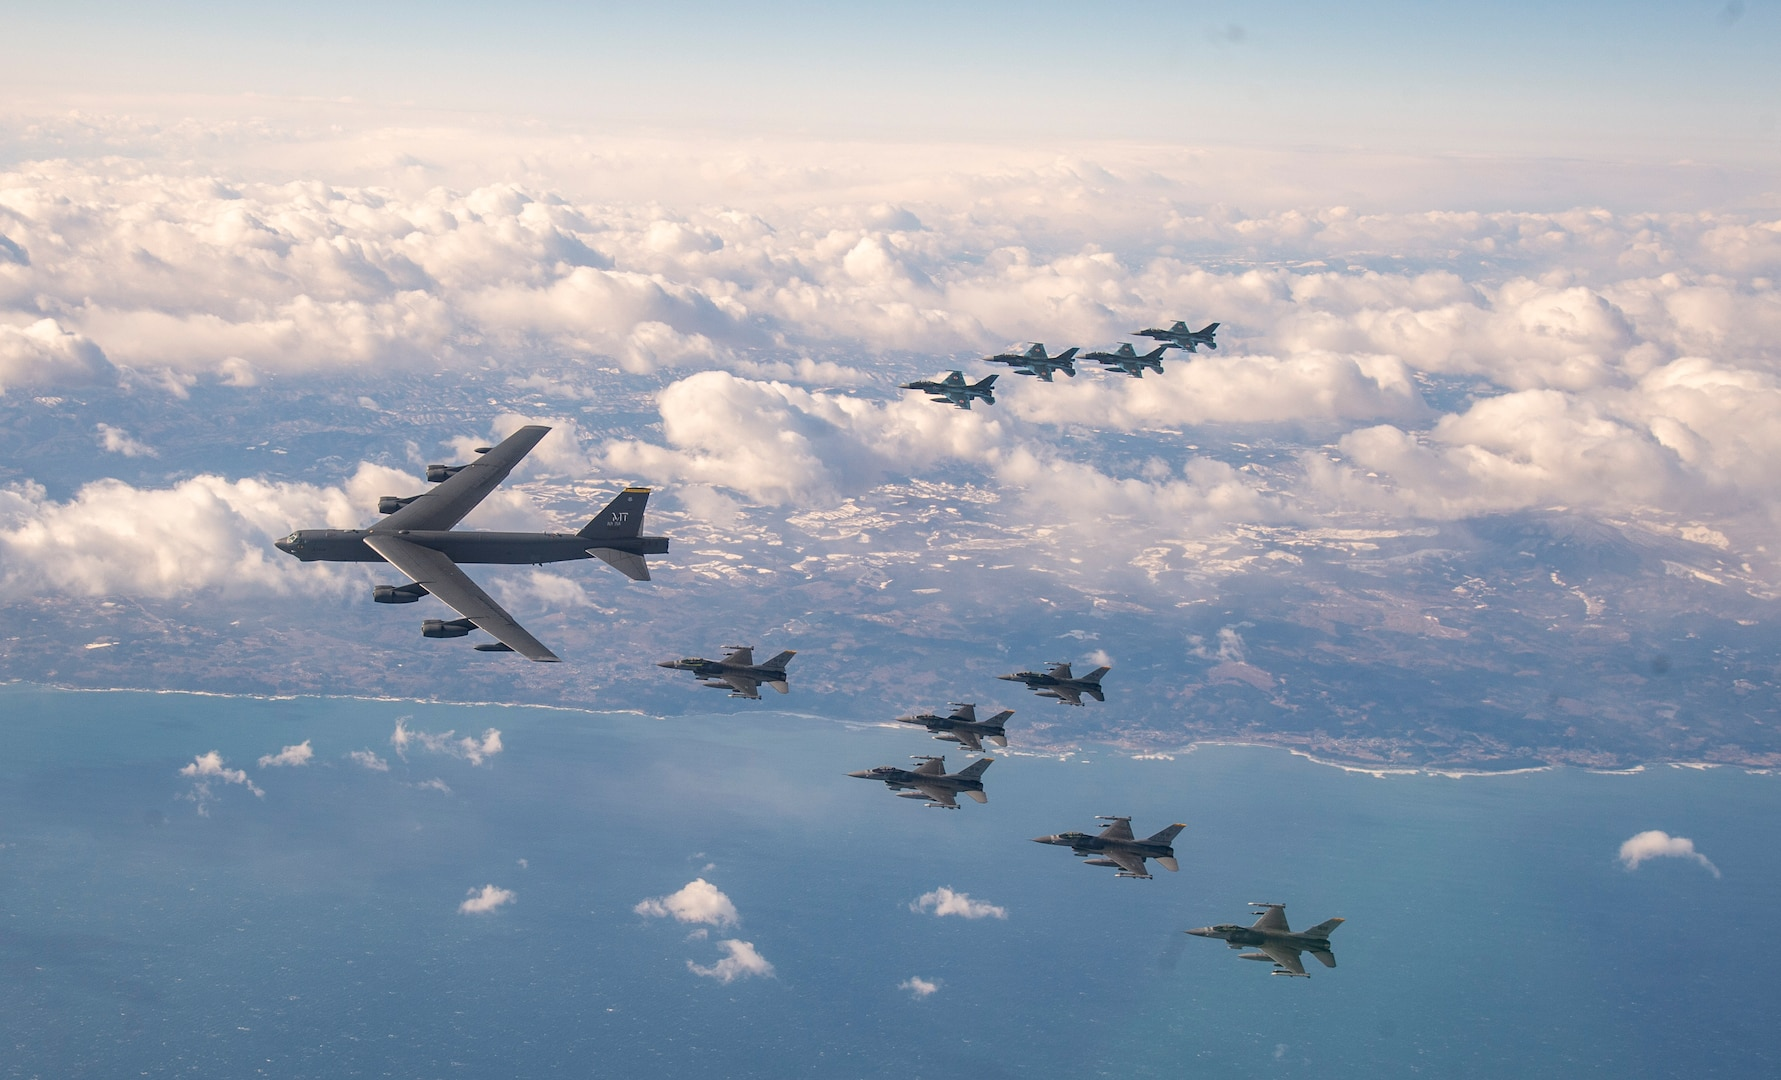 Misawa F-16 Pilots Integrate with Bombers, Koku Jieitai Counterparts